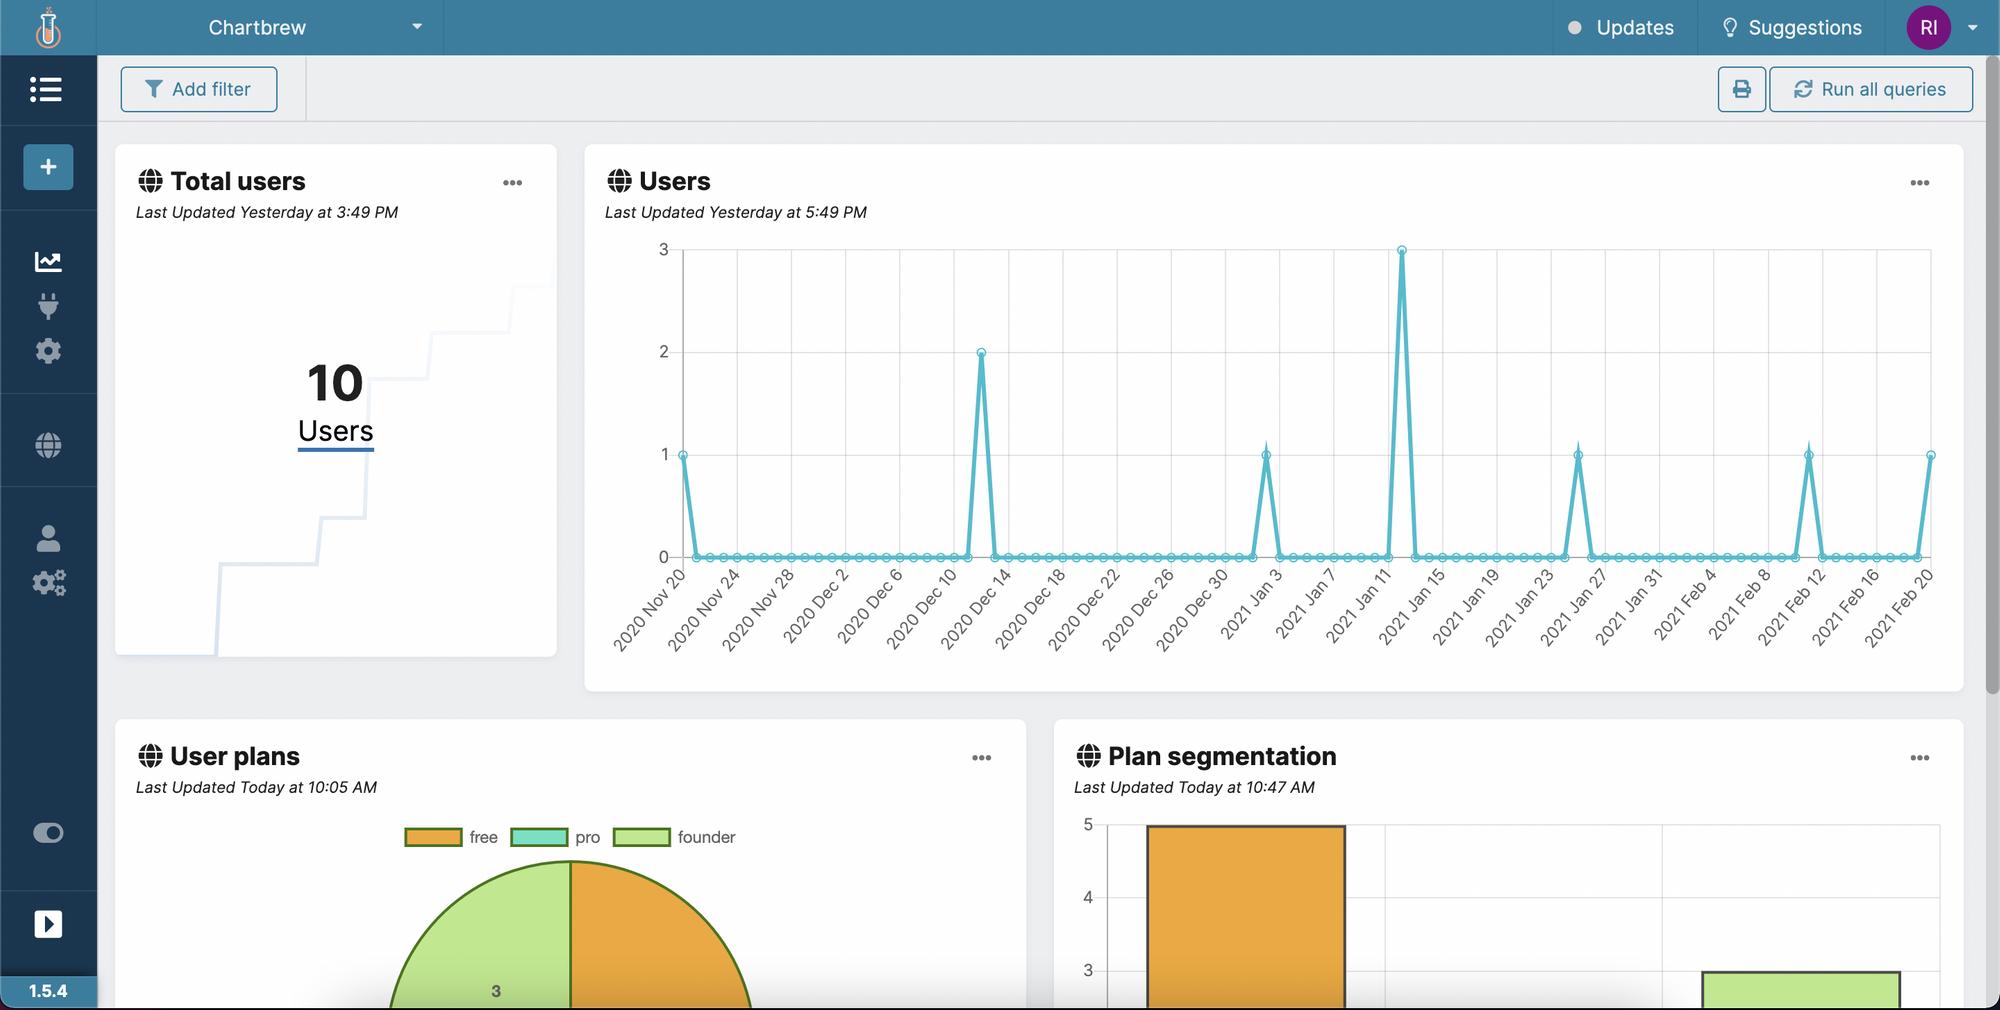 Chartbrew visualization dashboard for Supabase.io